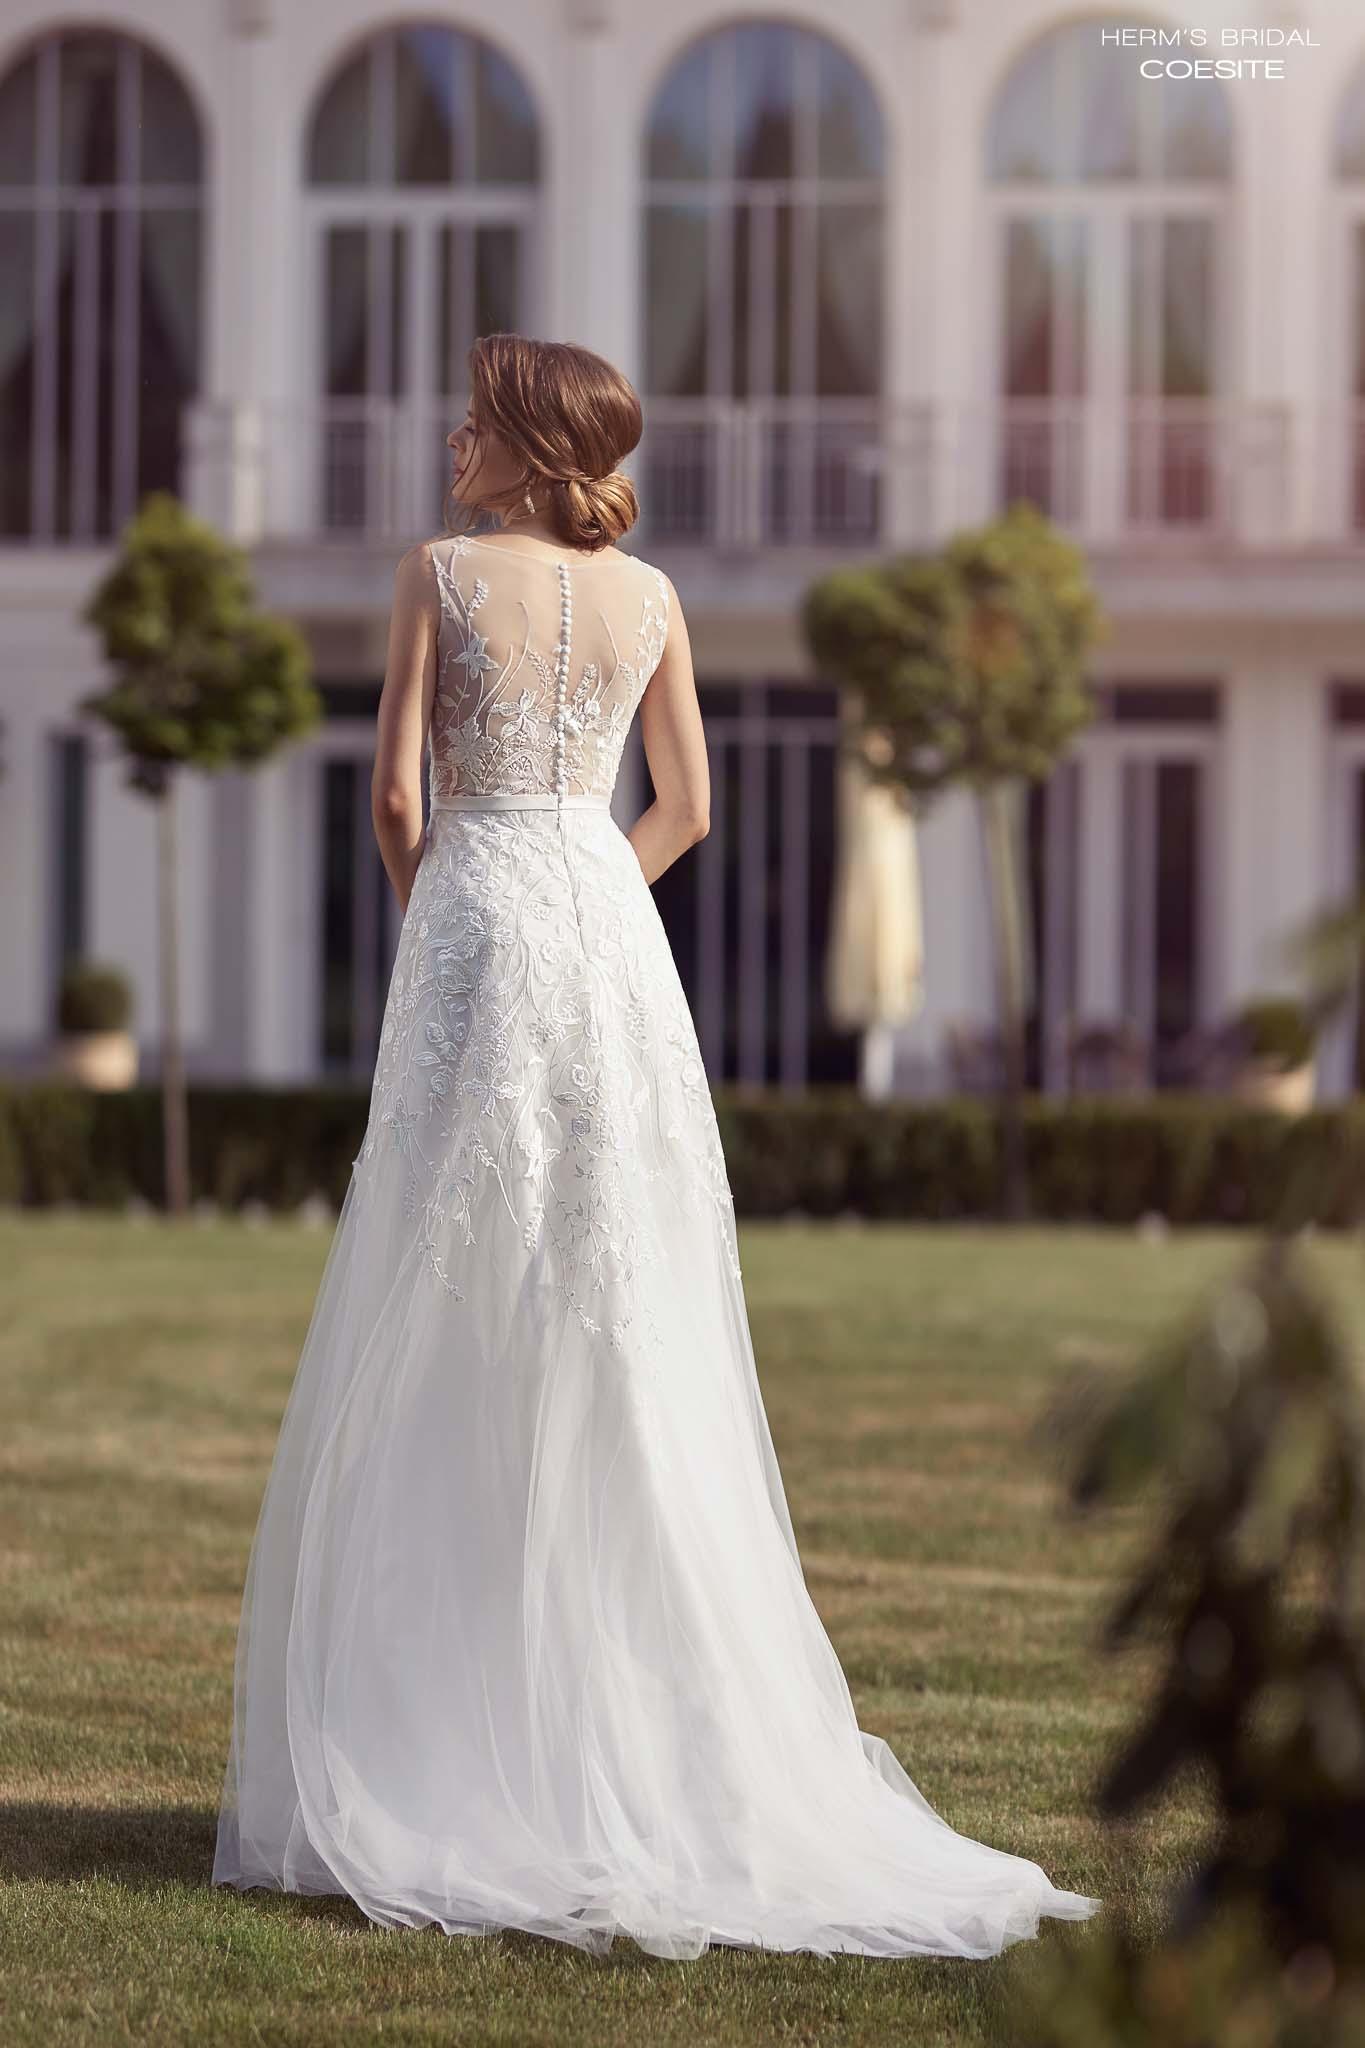 suknia slubna herms bridal Coesite